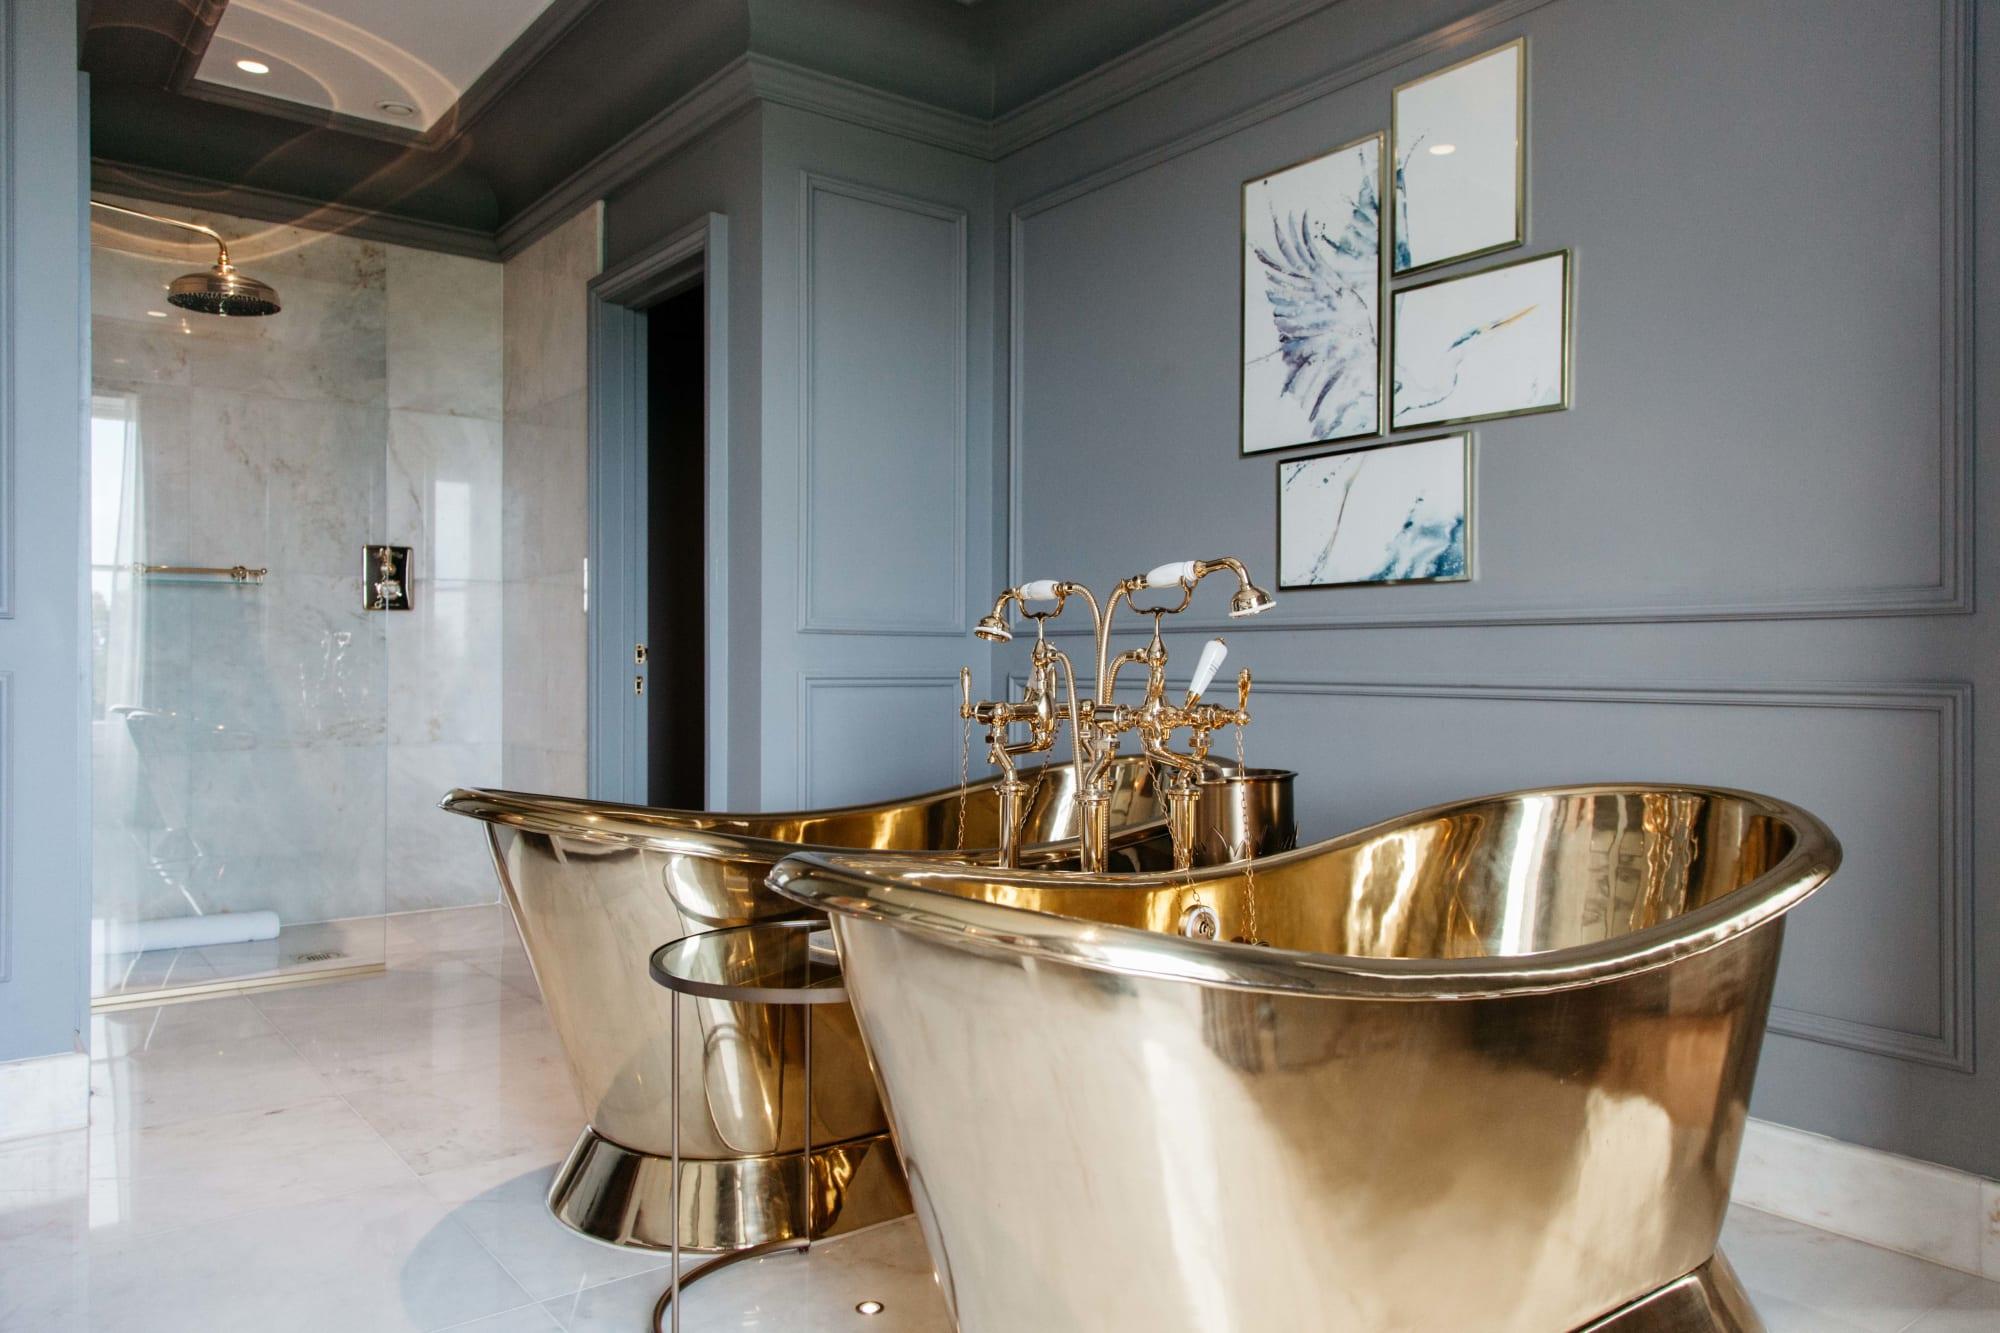 Interior Design by Meraki Design Ltd at Devon - Lympstone Manor